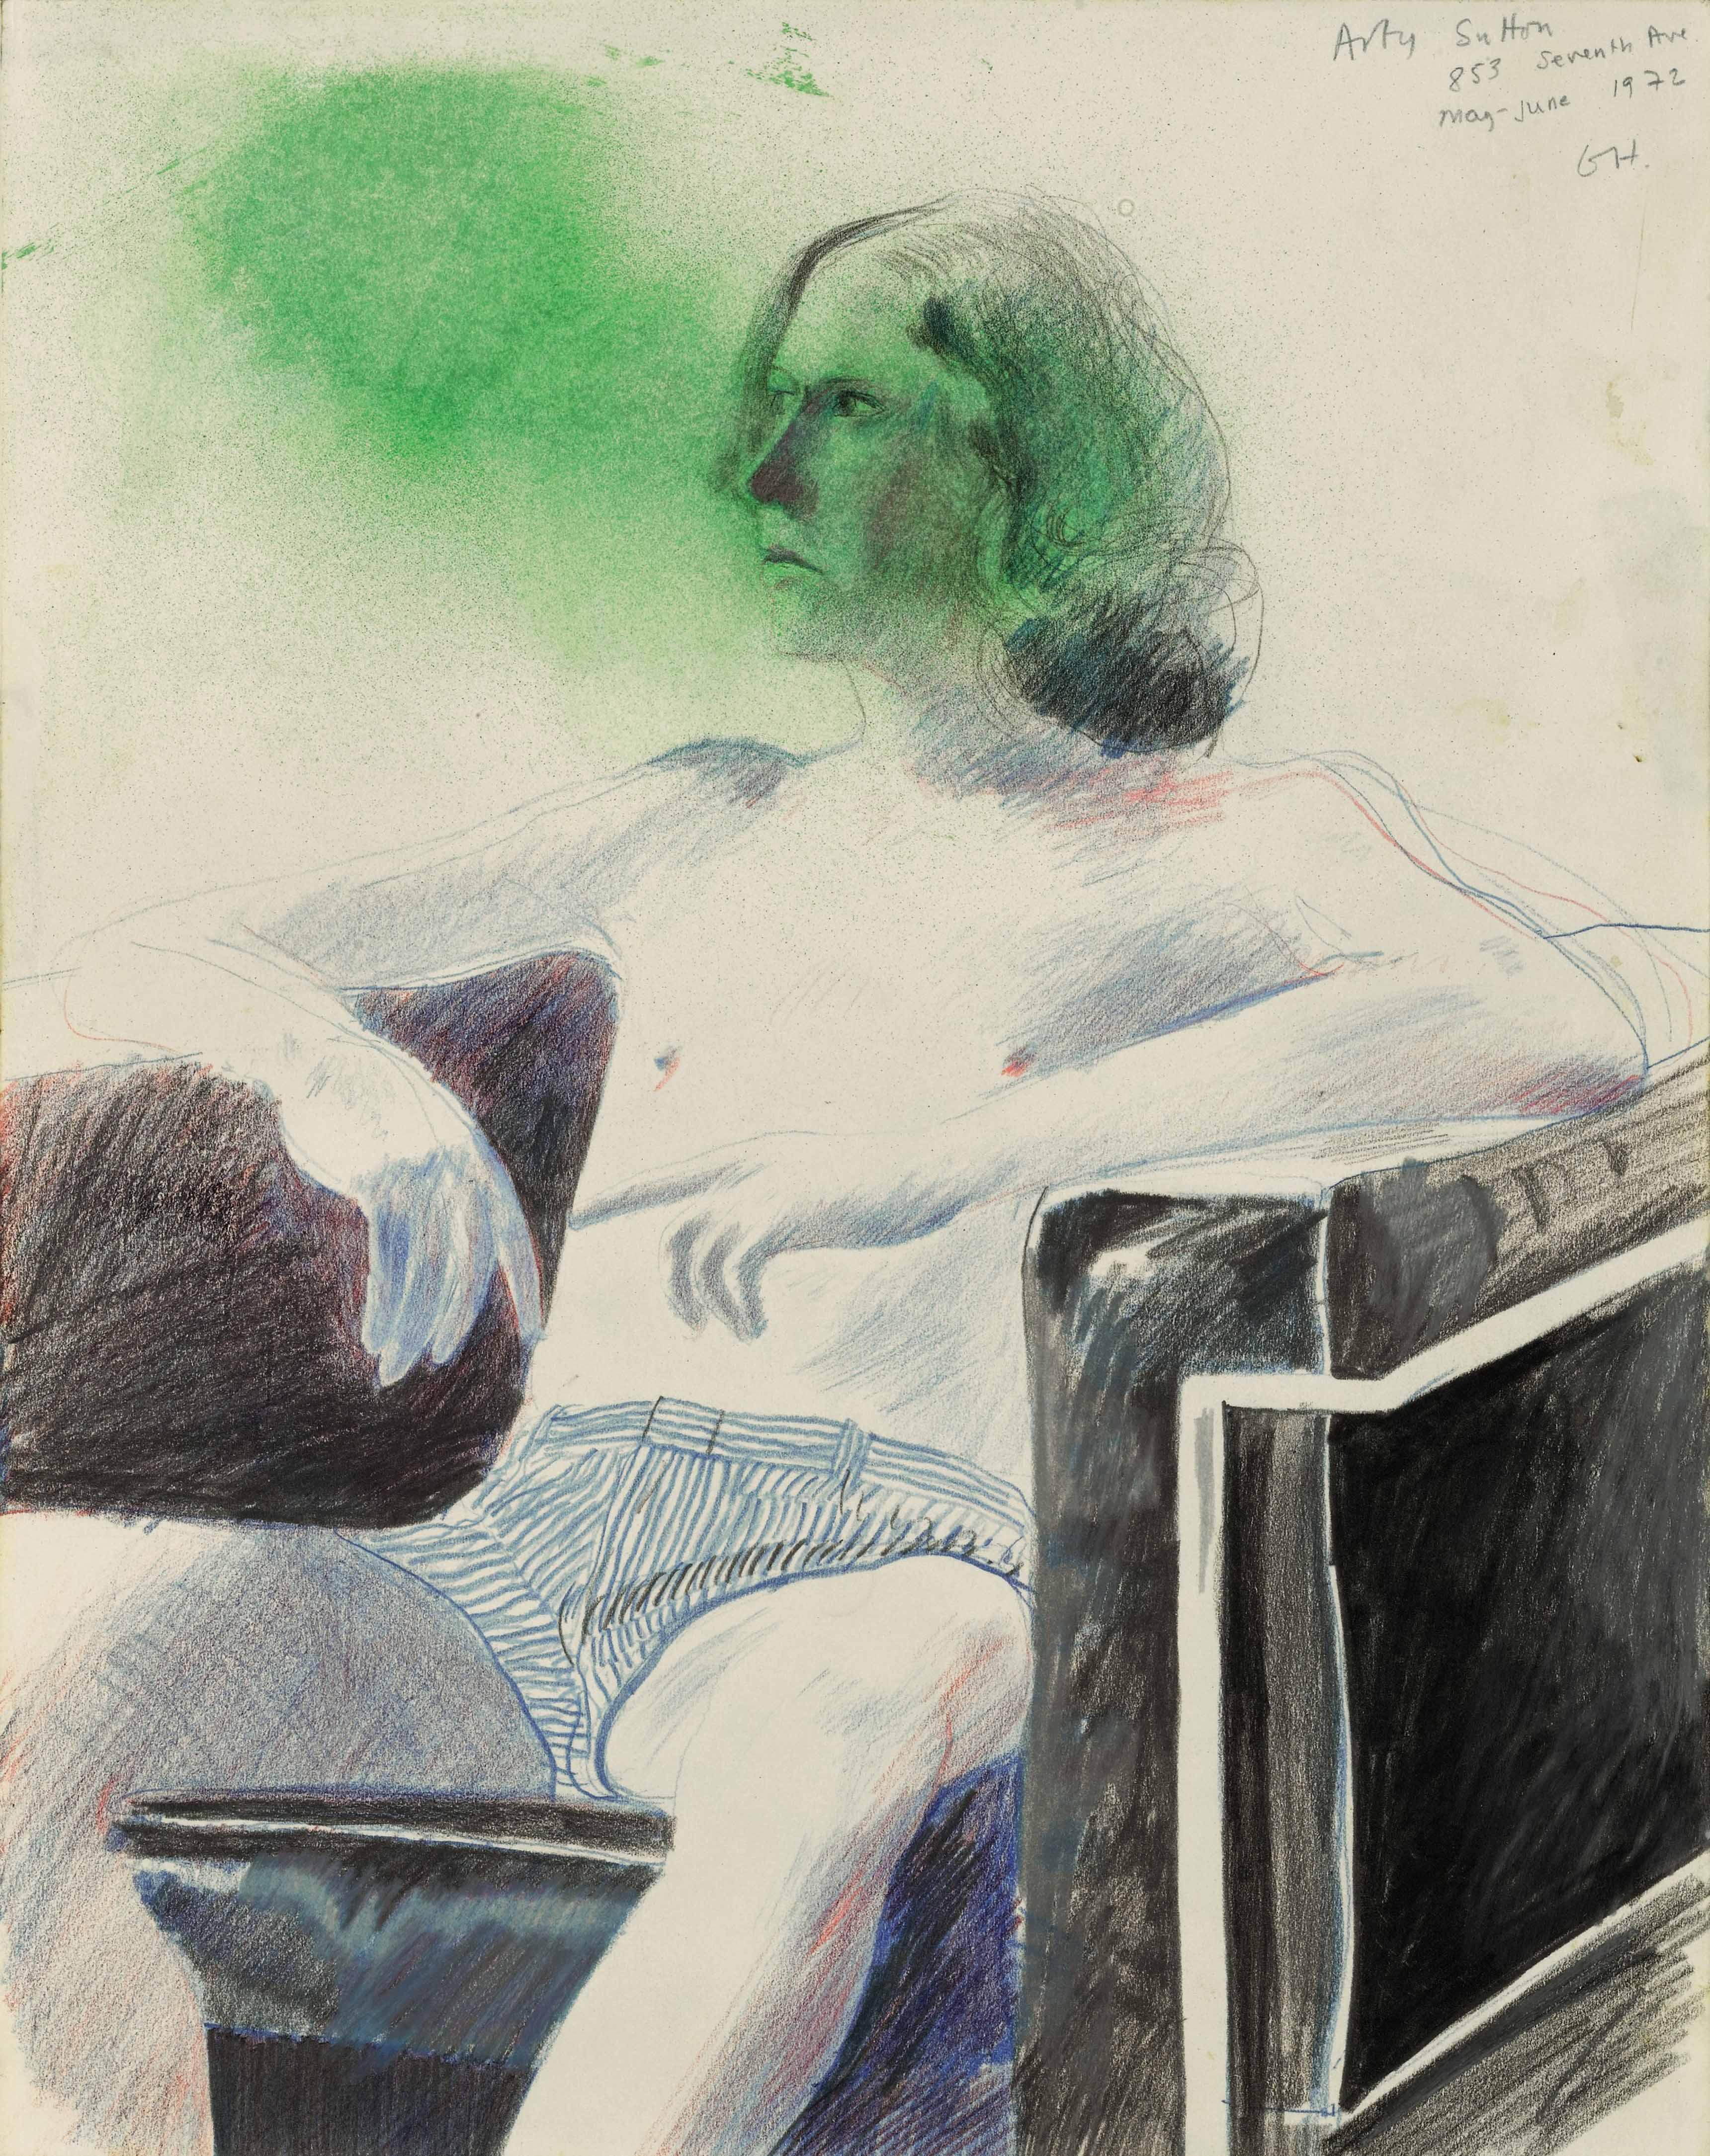 DAVID HOCKNEY ARTY SUTTON, 1972 Estimate : 80,000 - 120,000 EUR